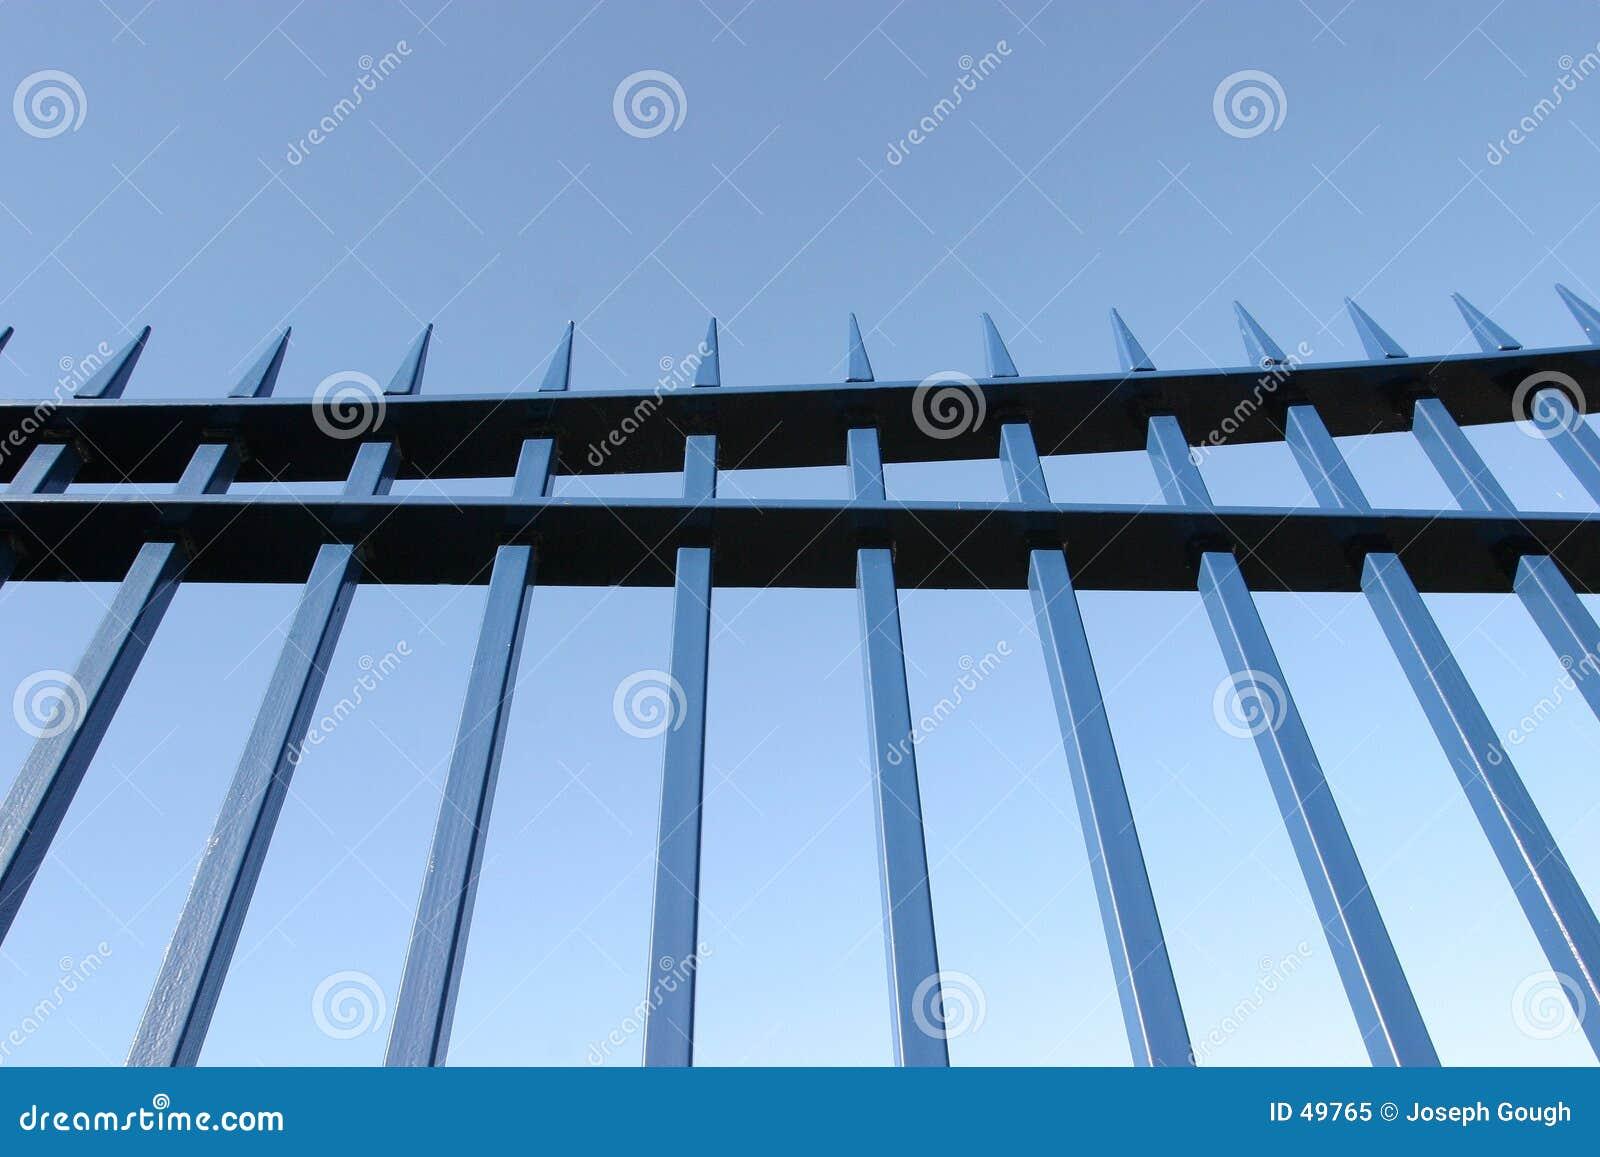 Blue Steel Gate Railings